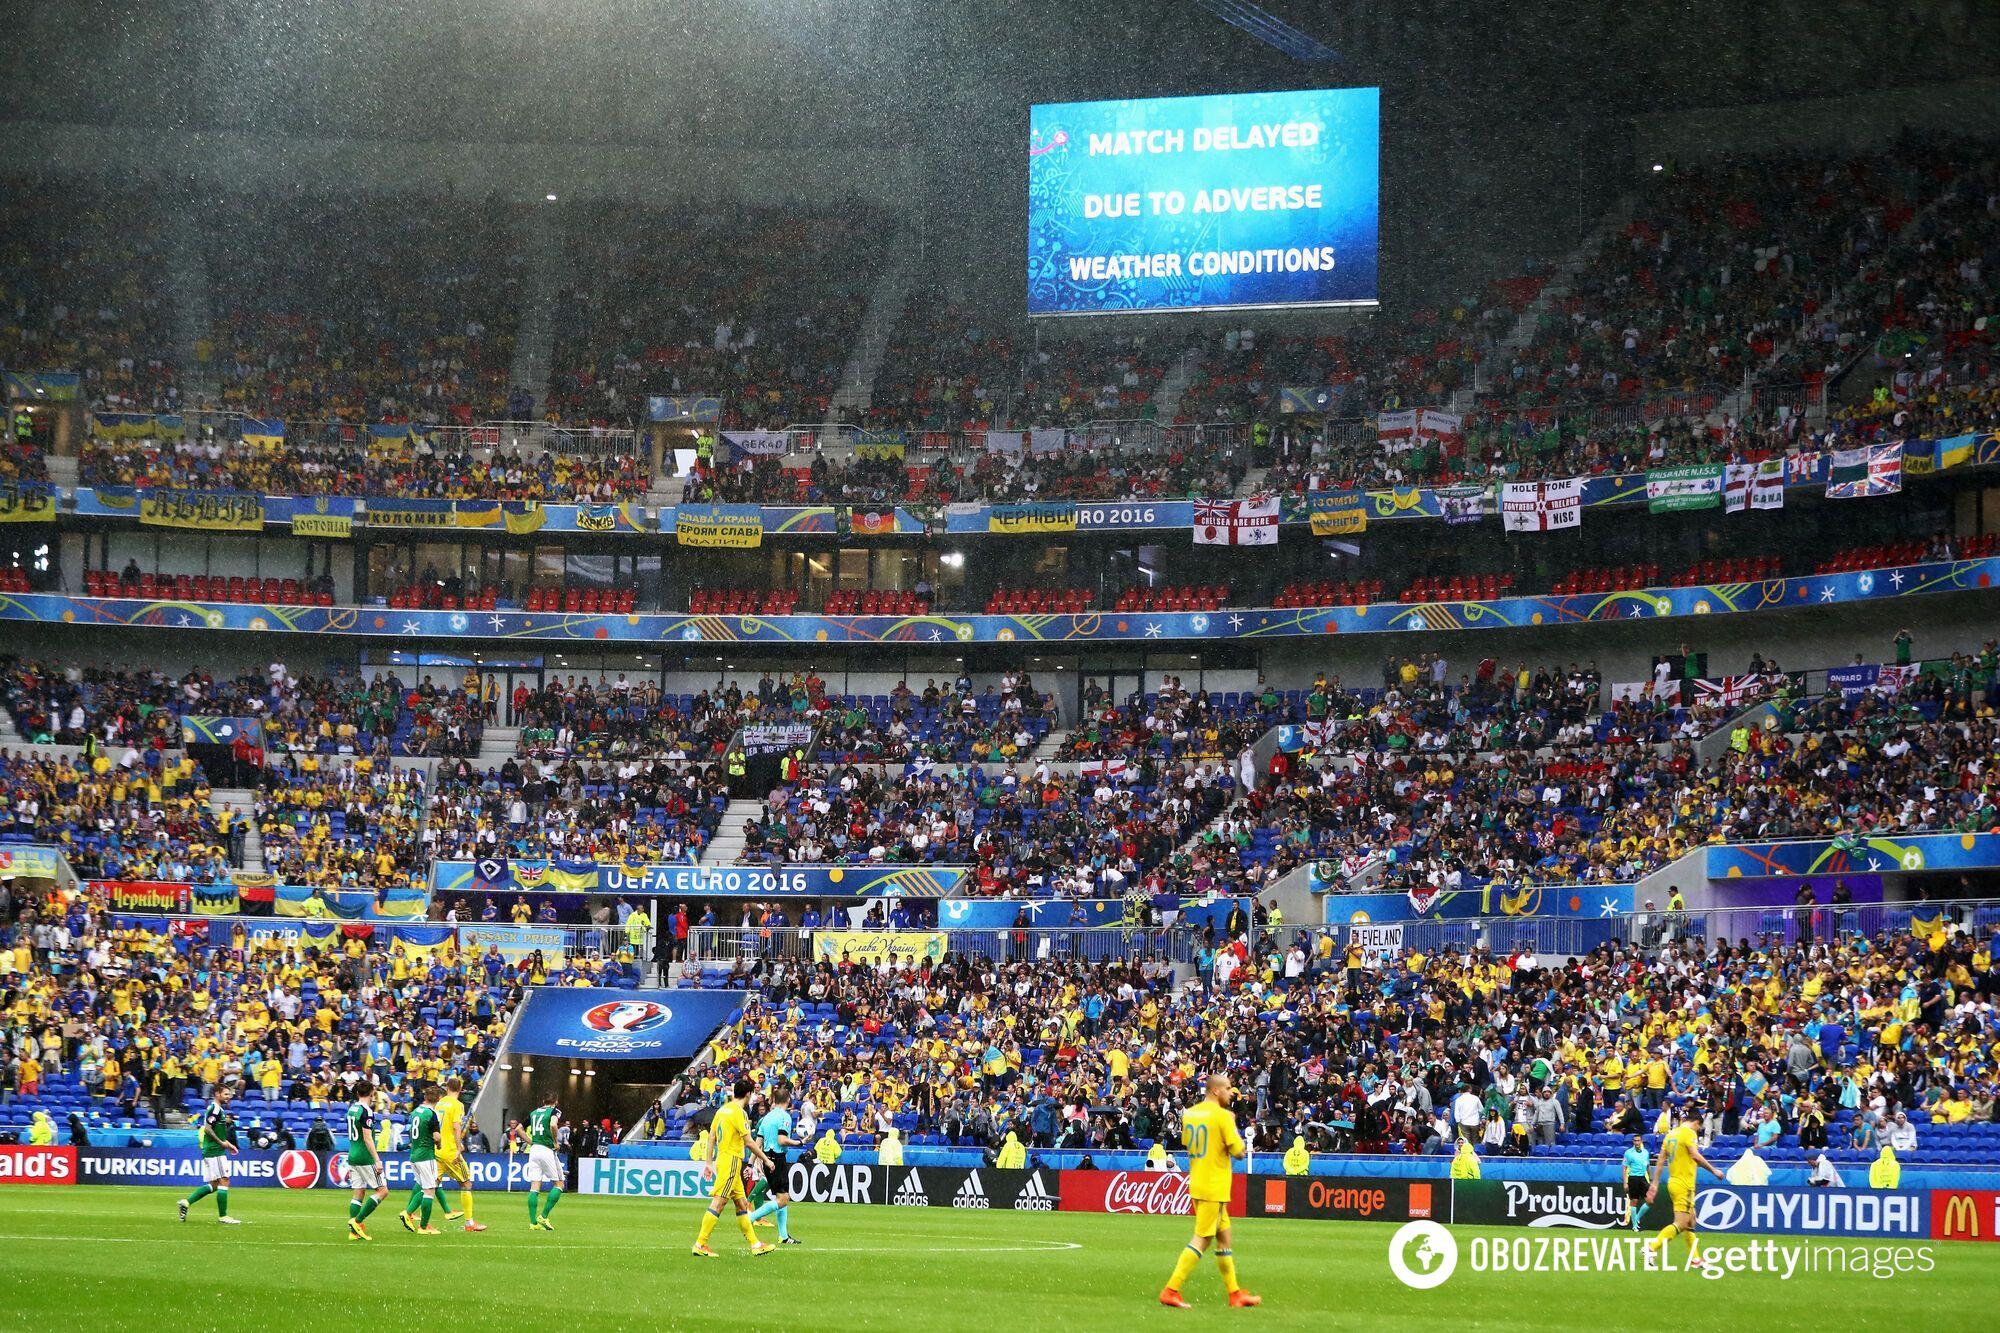 Матч команд на Евро-2016 был прерван из-за дождя.